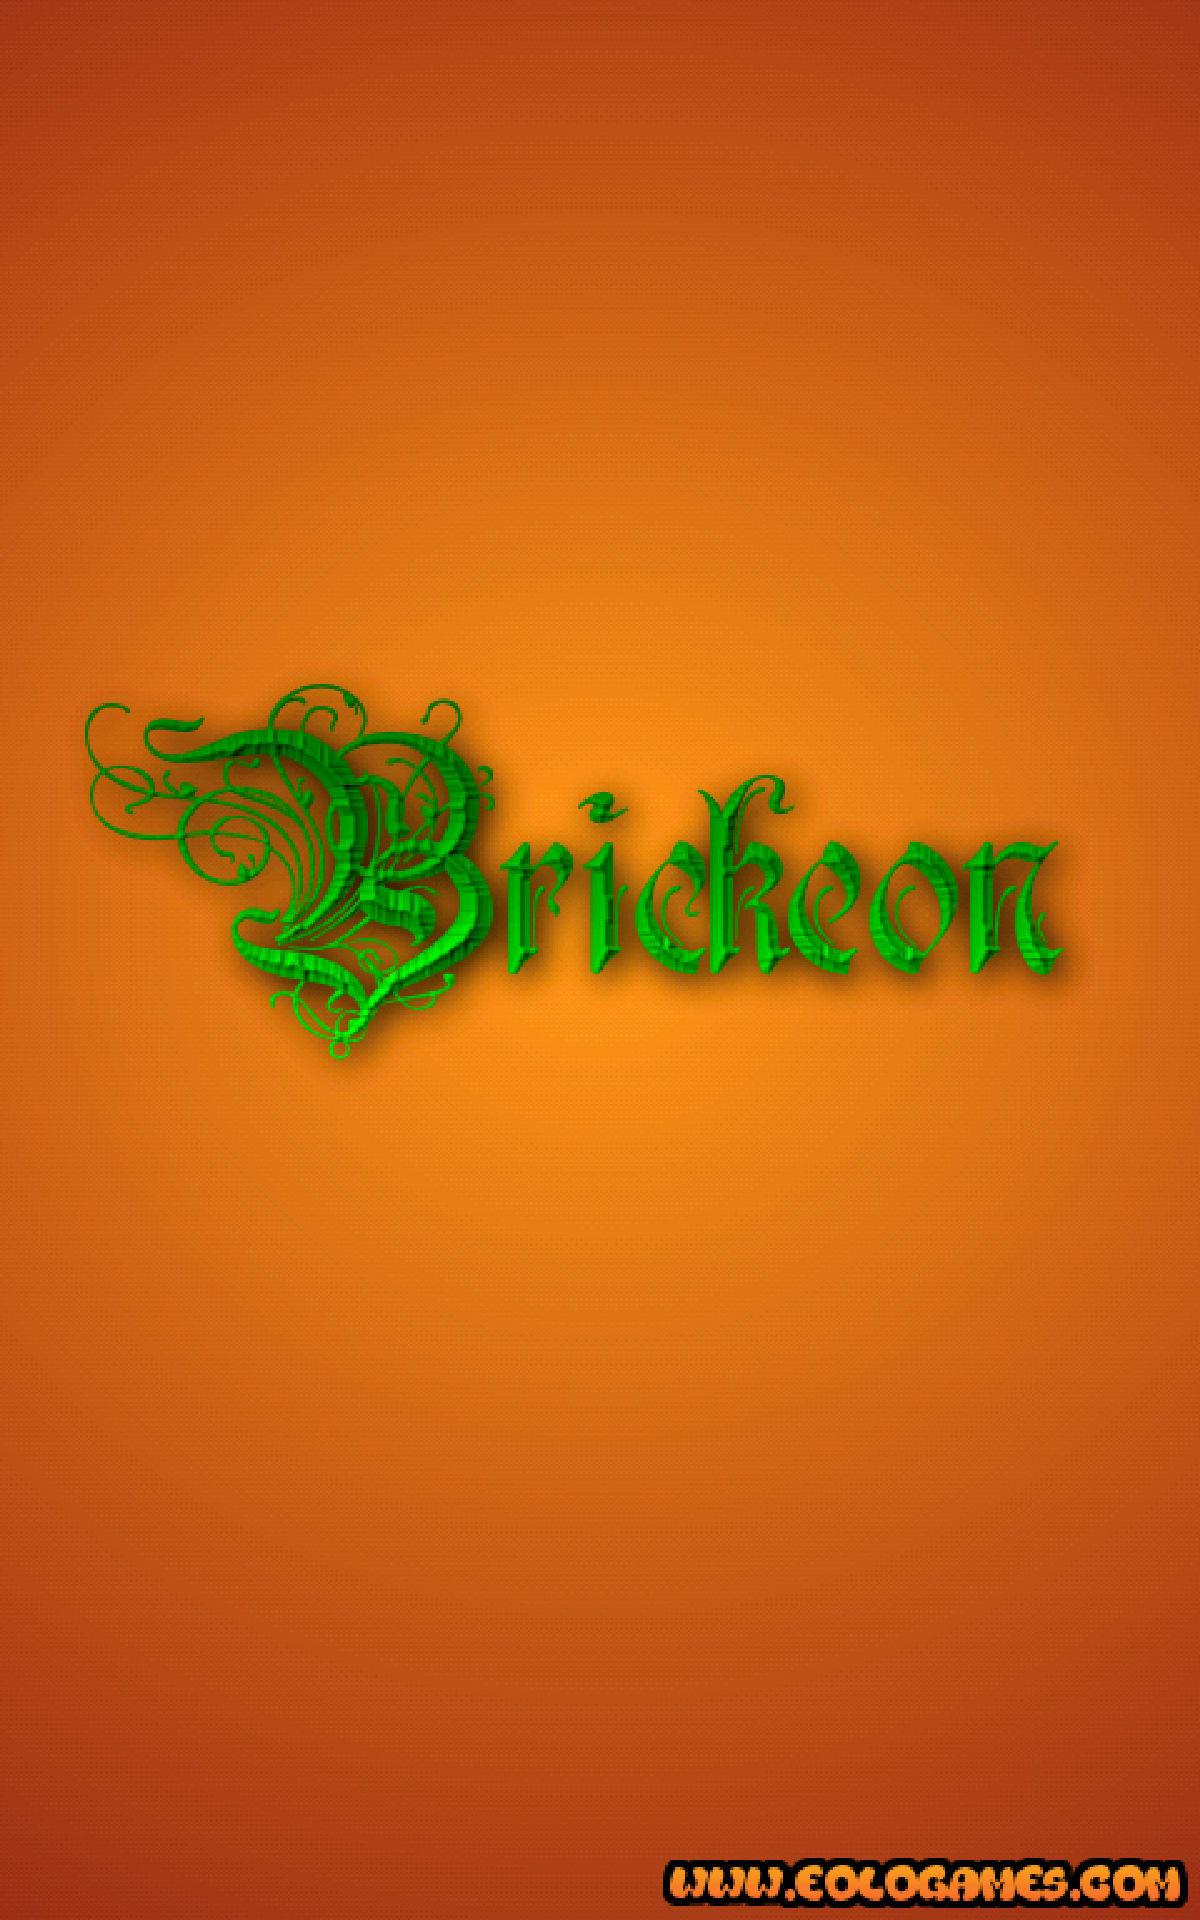 Brickeon - Brick Breaker Game